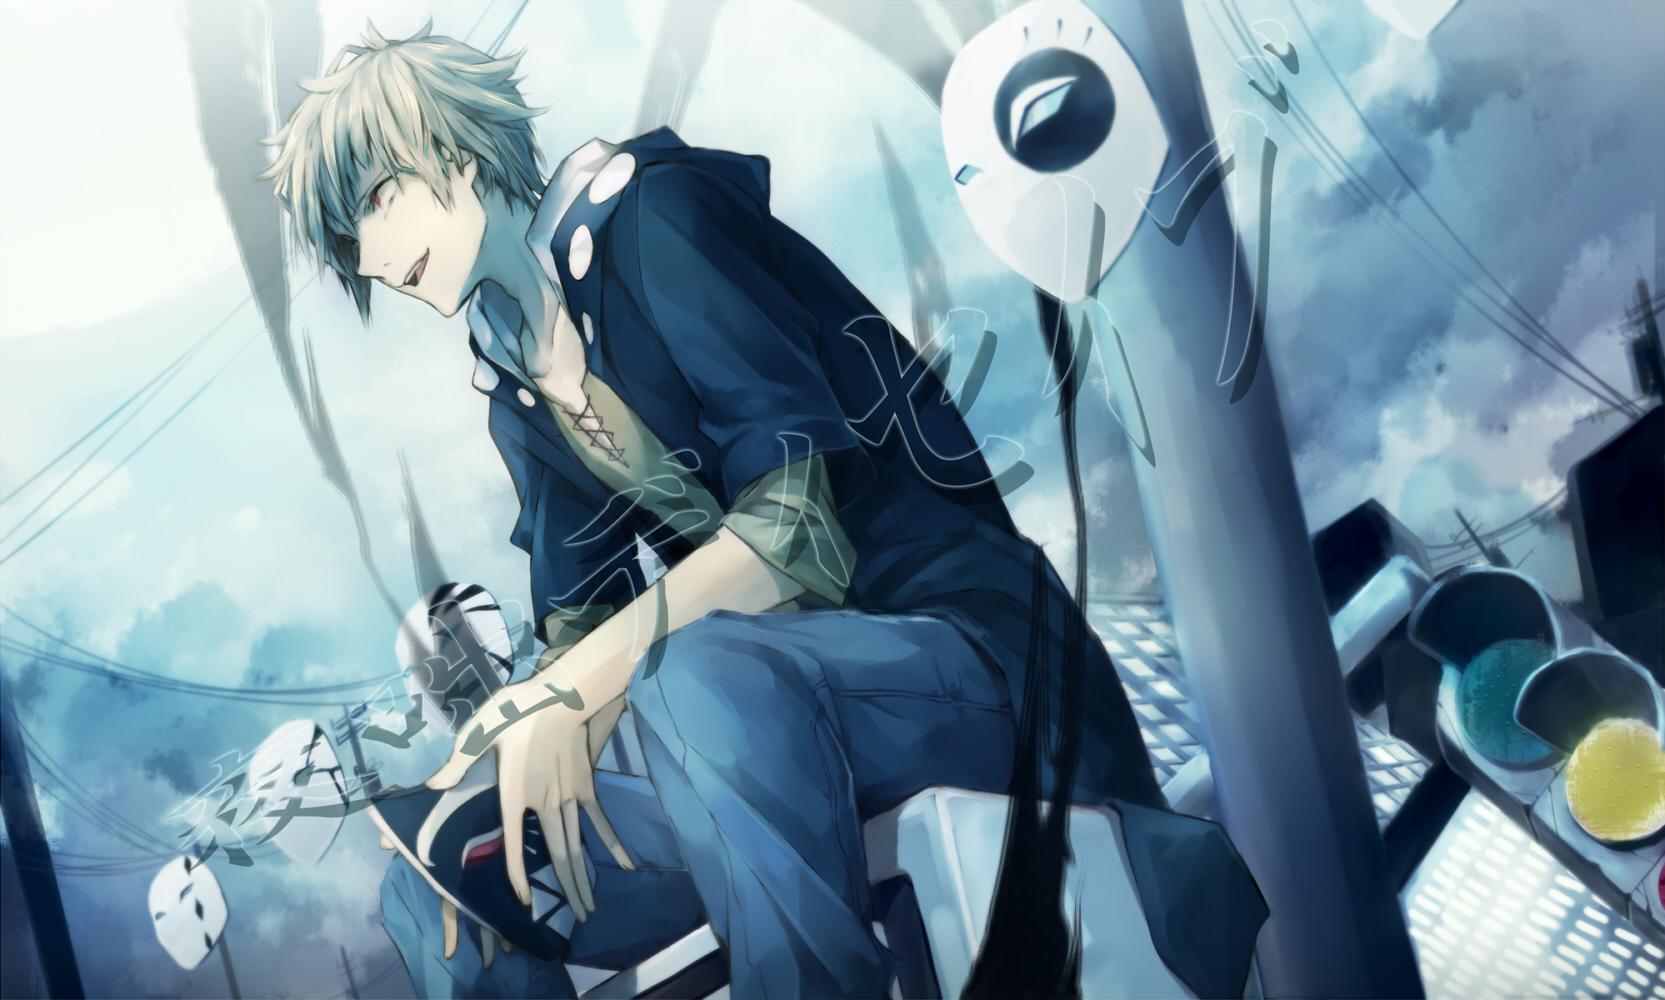 Kano shuuya fanart zerochan anime image board - Fanart anime wallpaper ...